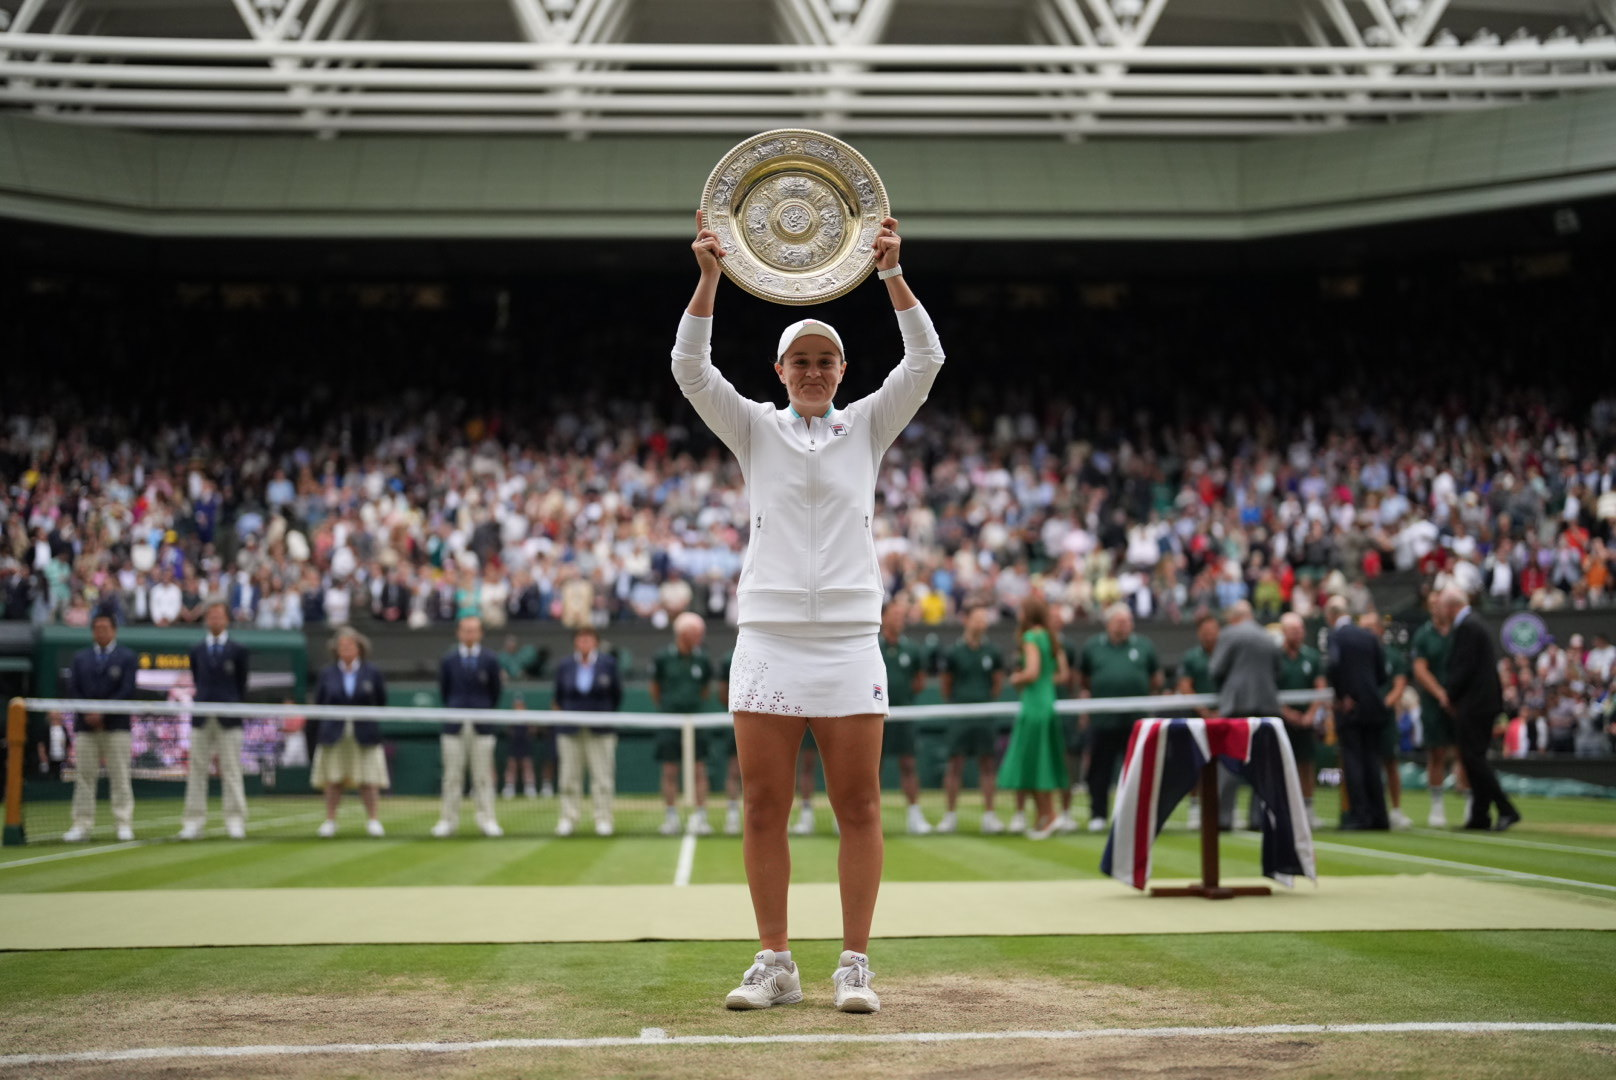 VIDEO/ Barty fiton turneun e Wimbledon, mund çeken Pliskova në finale